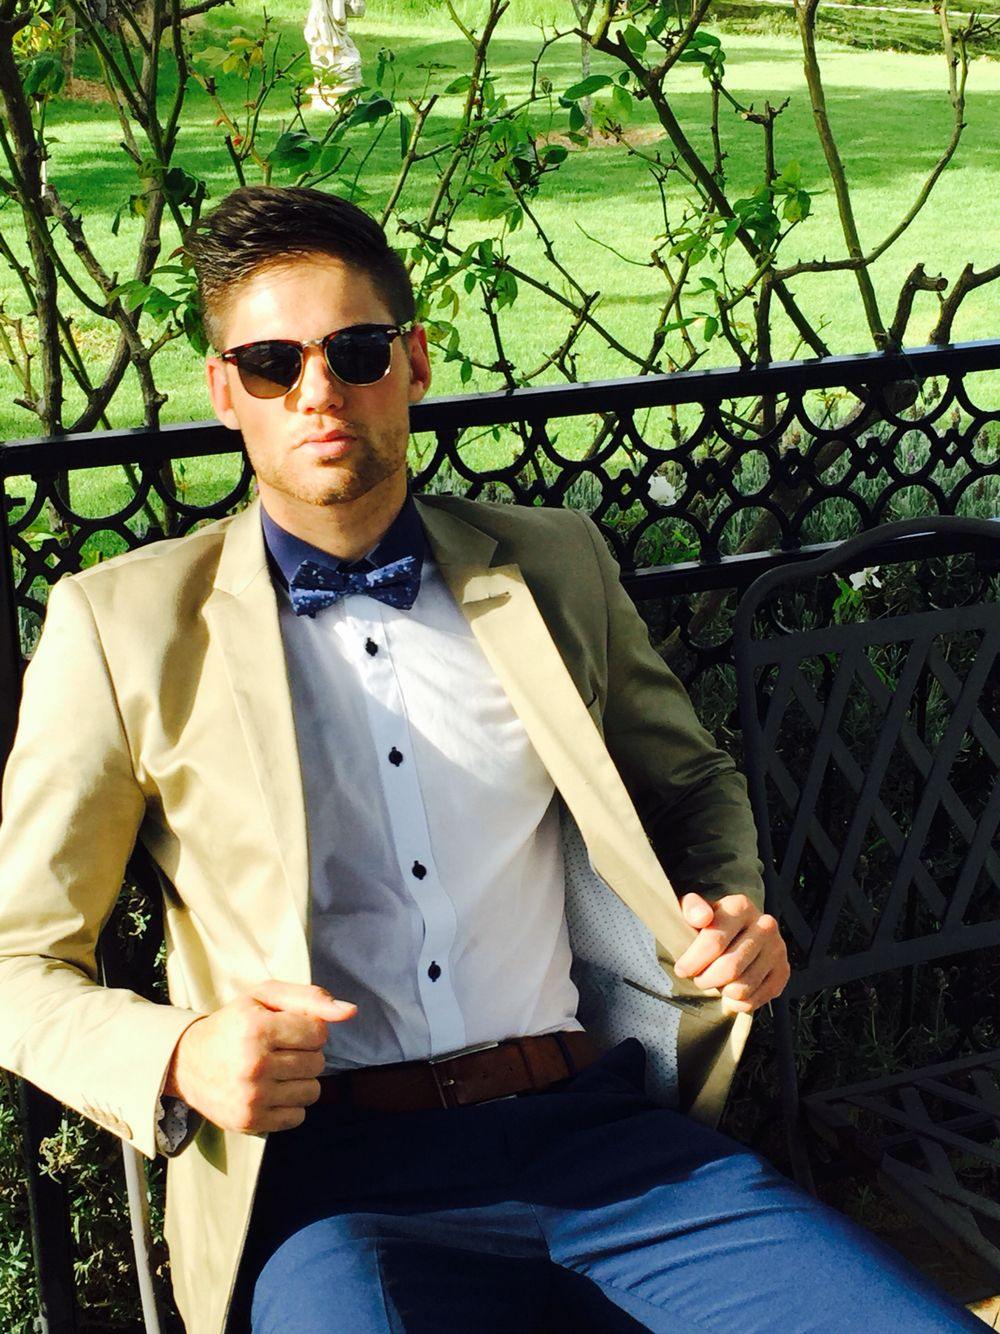 Wedding fashions is the best! Model Steven Bruggemann